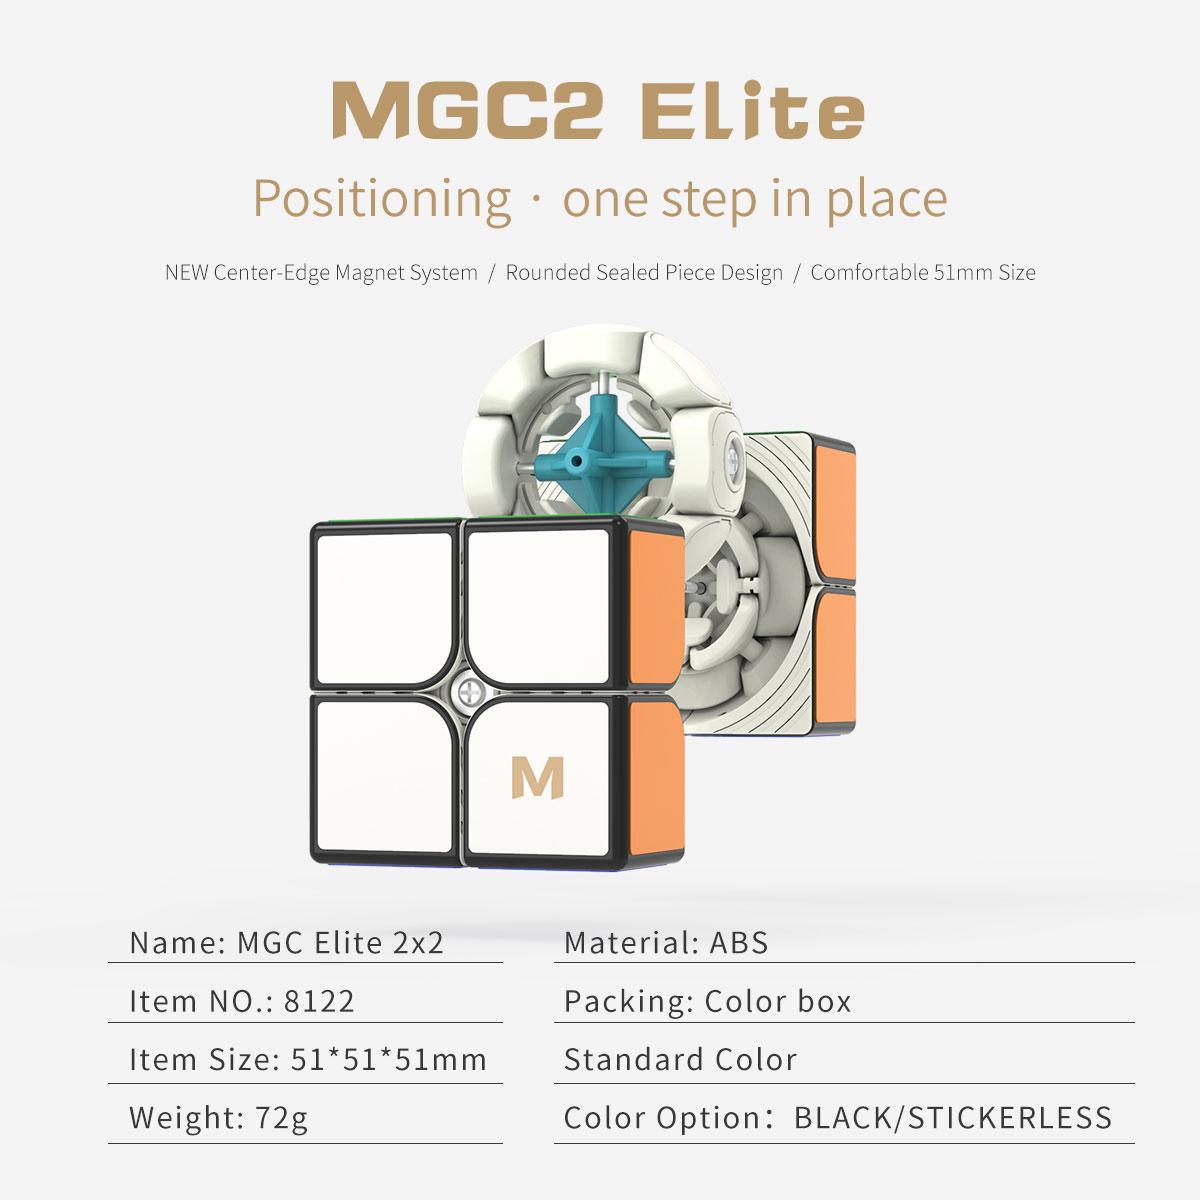 yj-mgc2-elite-2x2-specs